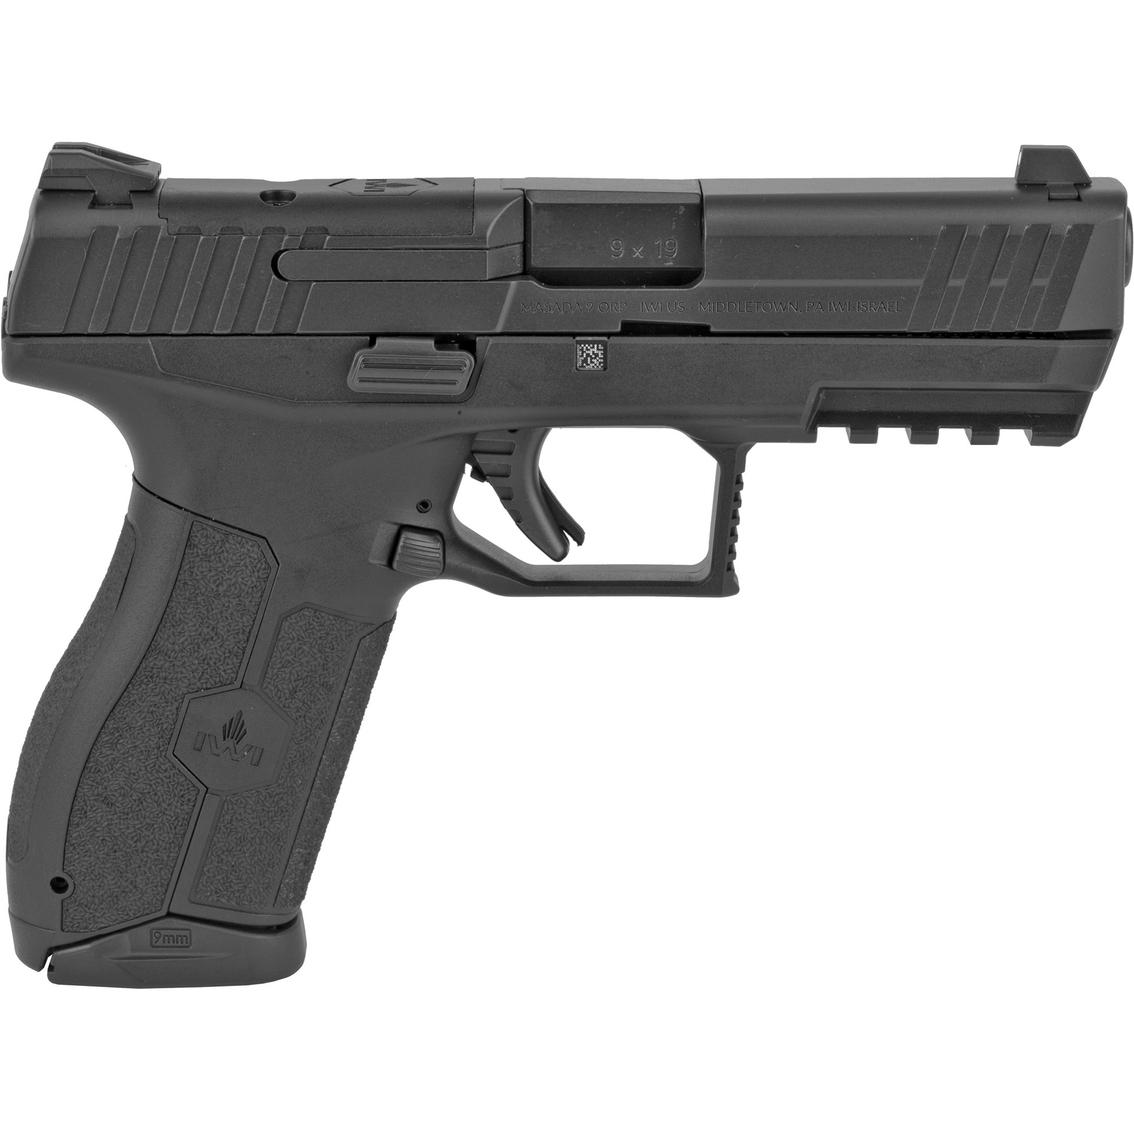 Iwi Masada 9mm 4 1 In Barrel 17 Rnd Pistol Black Handguns Sports Outdoors Shop The Exchange